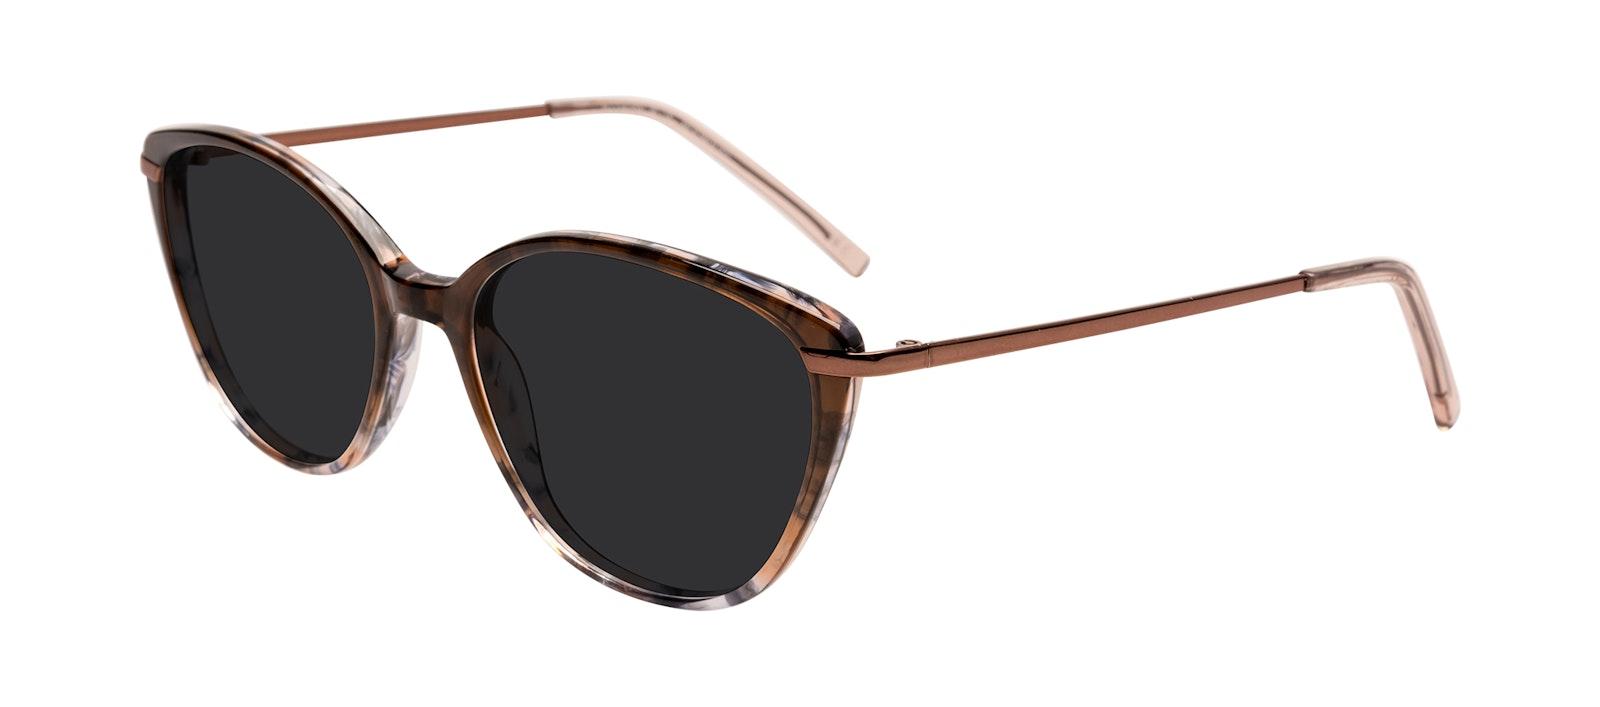 Affordable Fashion Glasses Sunglasses Women Illusion Plus Moondust Tilt